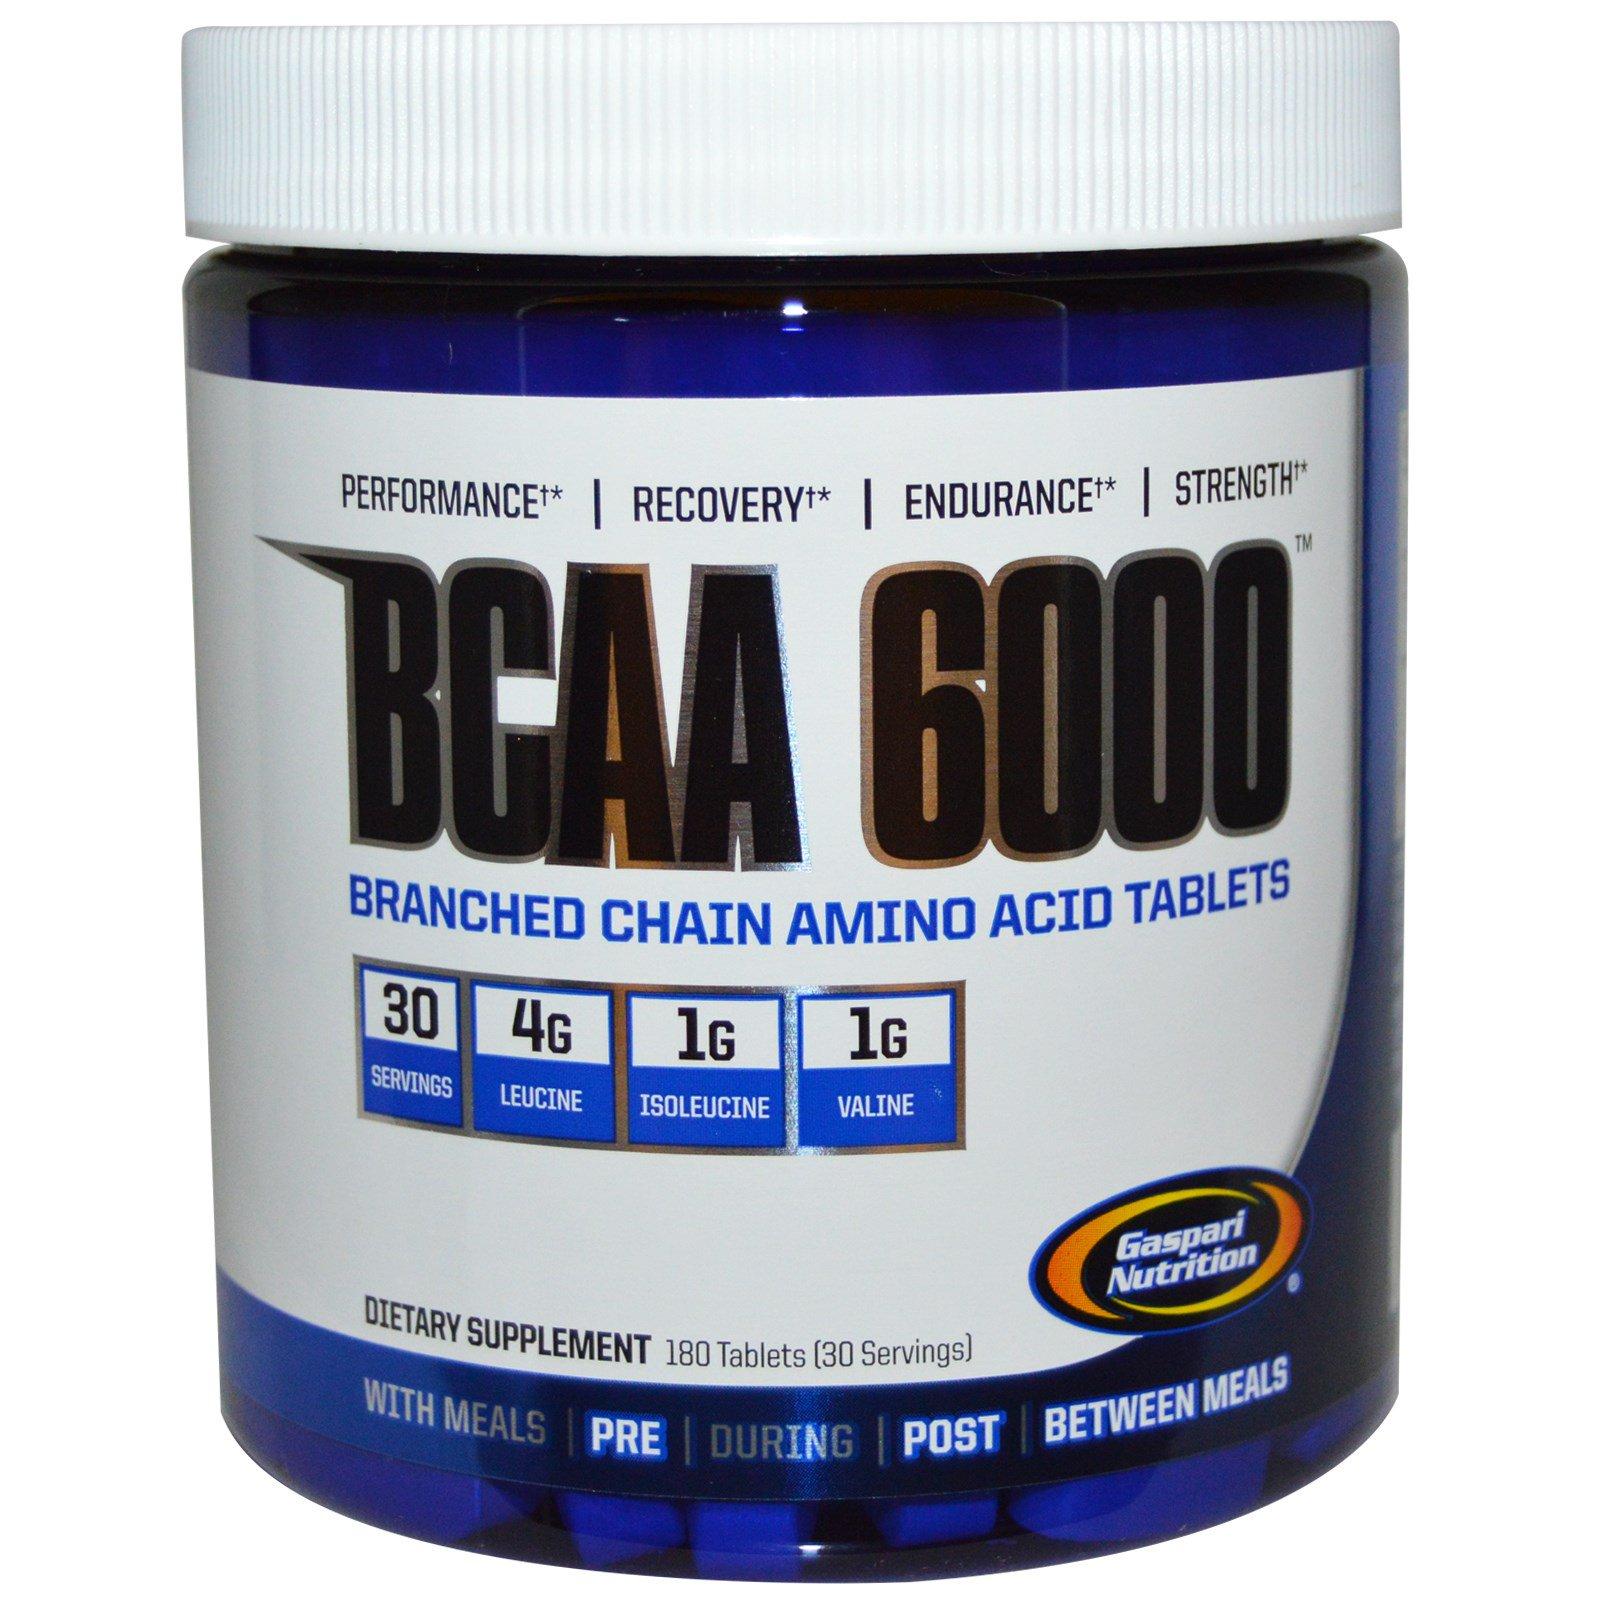 Gaspari Nutrition Bcaa 6000 180 Tablets Amino Dymatize 500 Tabs Discontinued Item